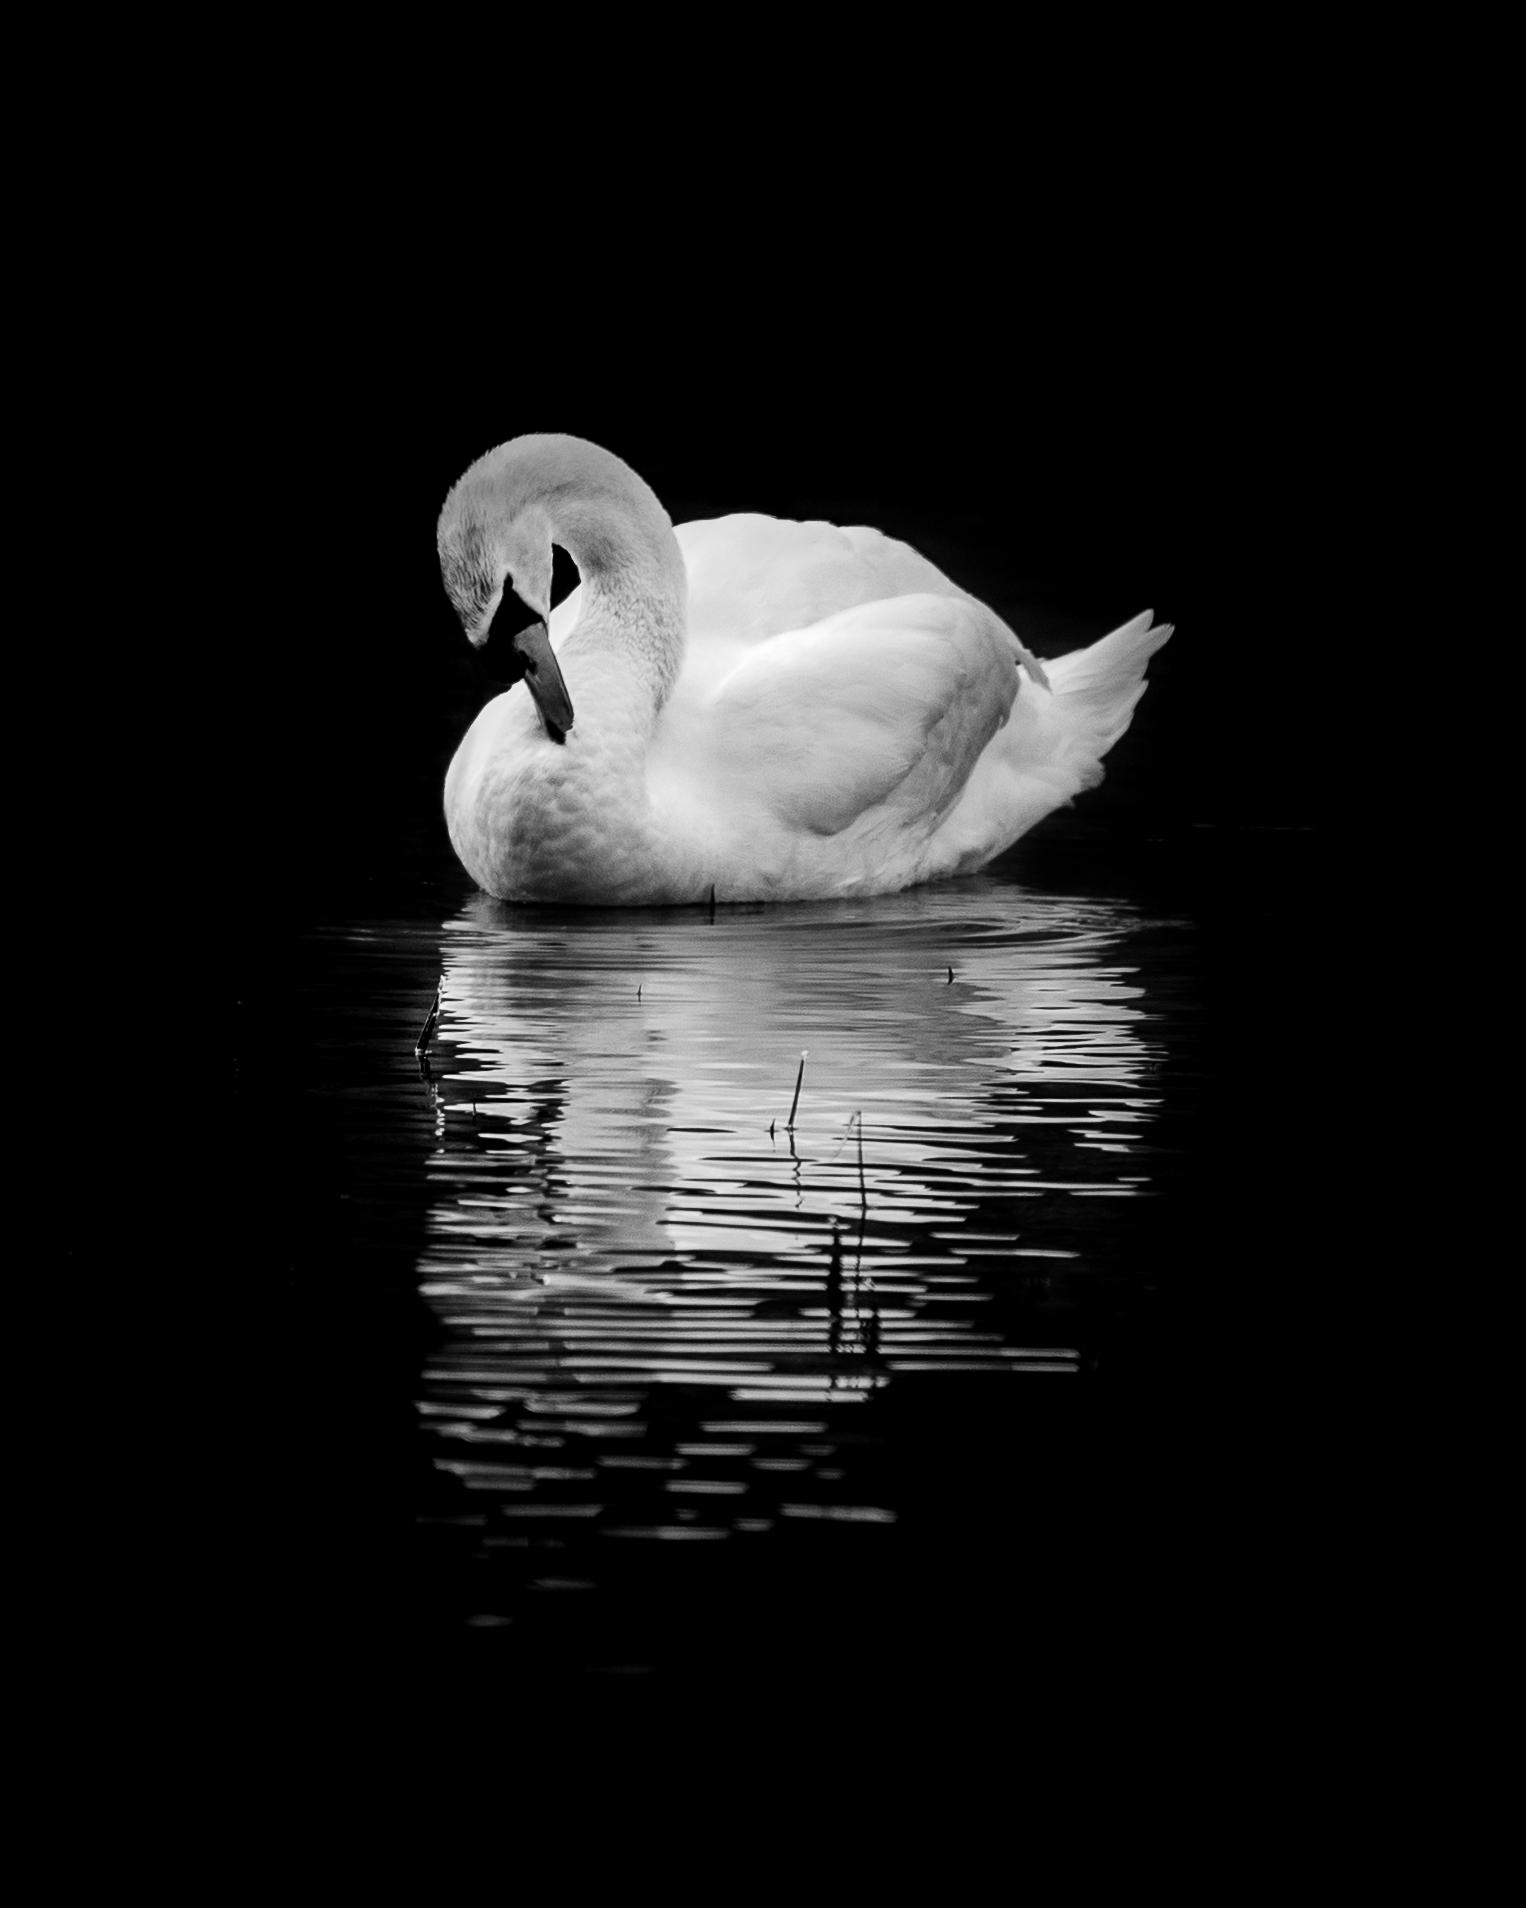 Preening Swan at Blenheim Palace •  kjbimagery.com